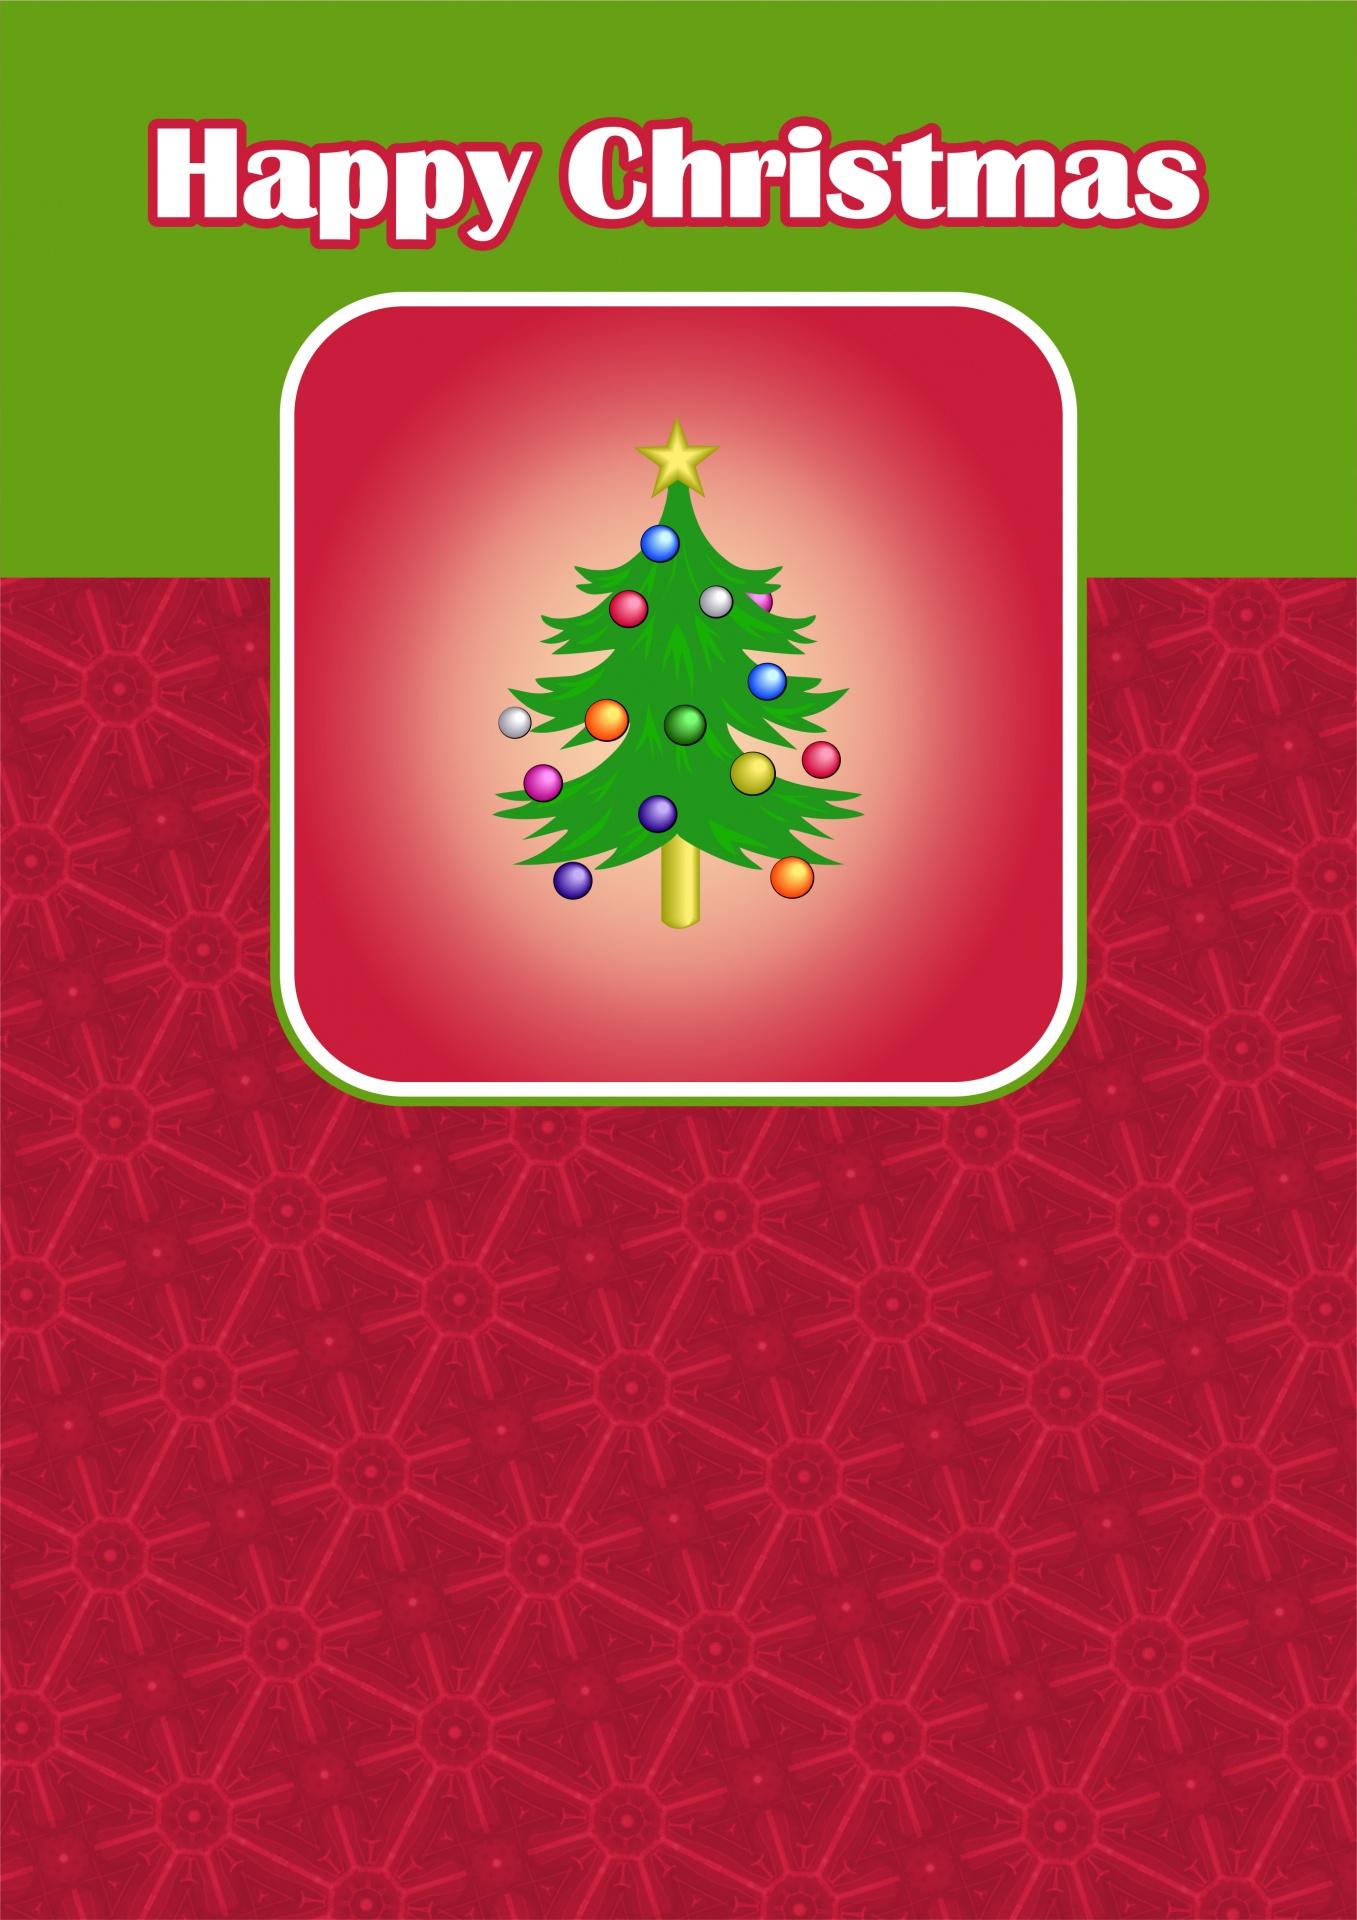 Christmas Card Clip Art Free Stock Photo Public Domain